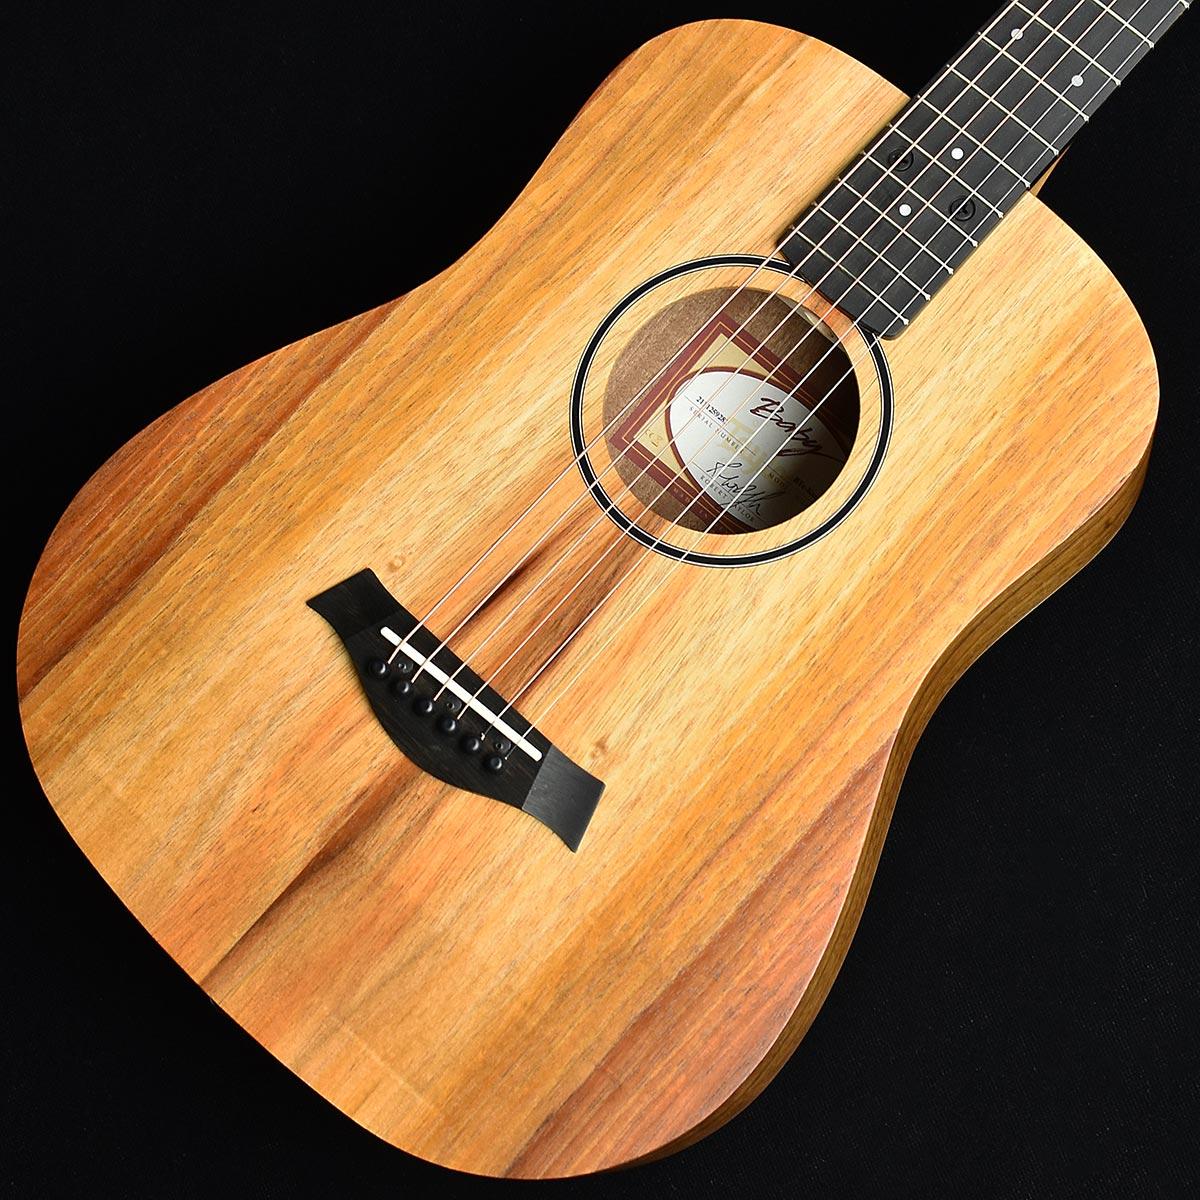 Taylor Baby Taylor-e Koa S/N:2111259282 ミニアコースティックギター【エレアコ】 【テイラー】【未展示品】